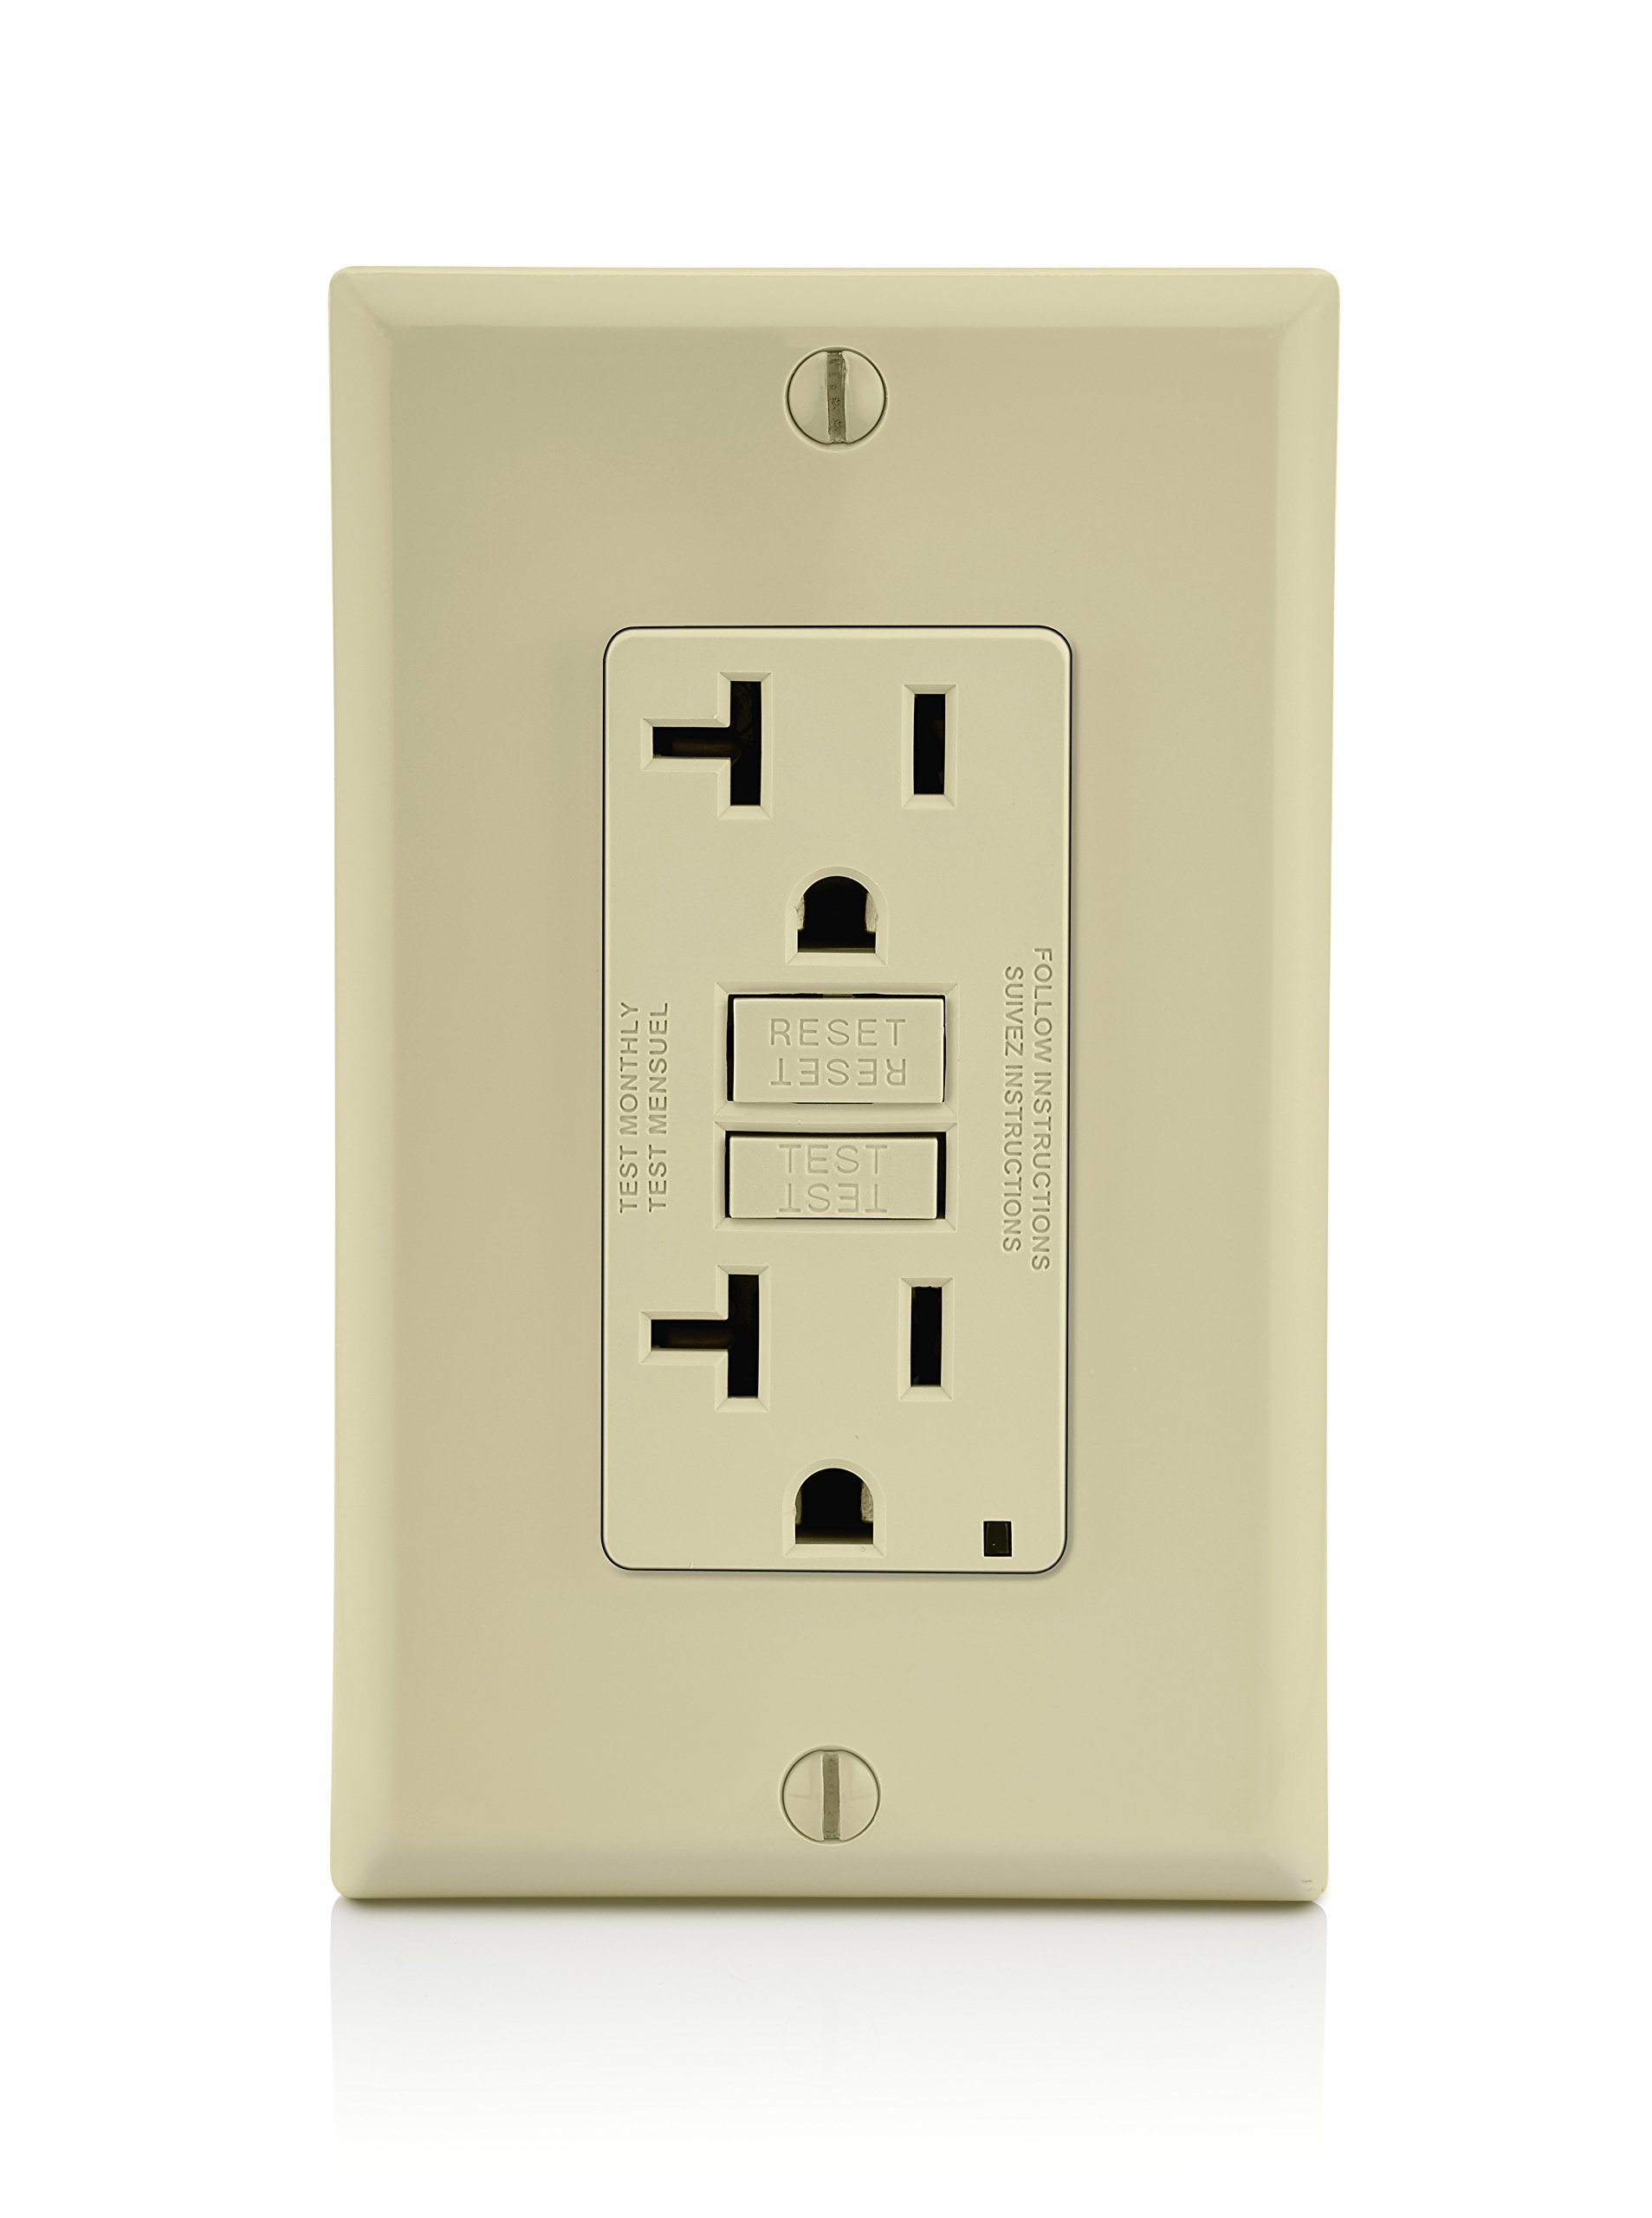 15 Amp 2 LED Power Indicators Ground Fault Circuit Interruptor Duplex Four-Bros Lighting Tamper Resistant /& Weather Resistant GFI 120//125V 1 Single GFCI Outlet Receptacle White UL2008